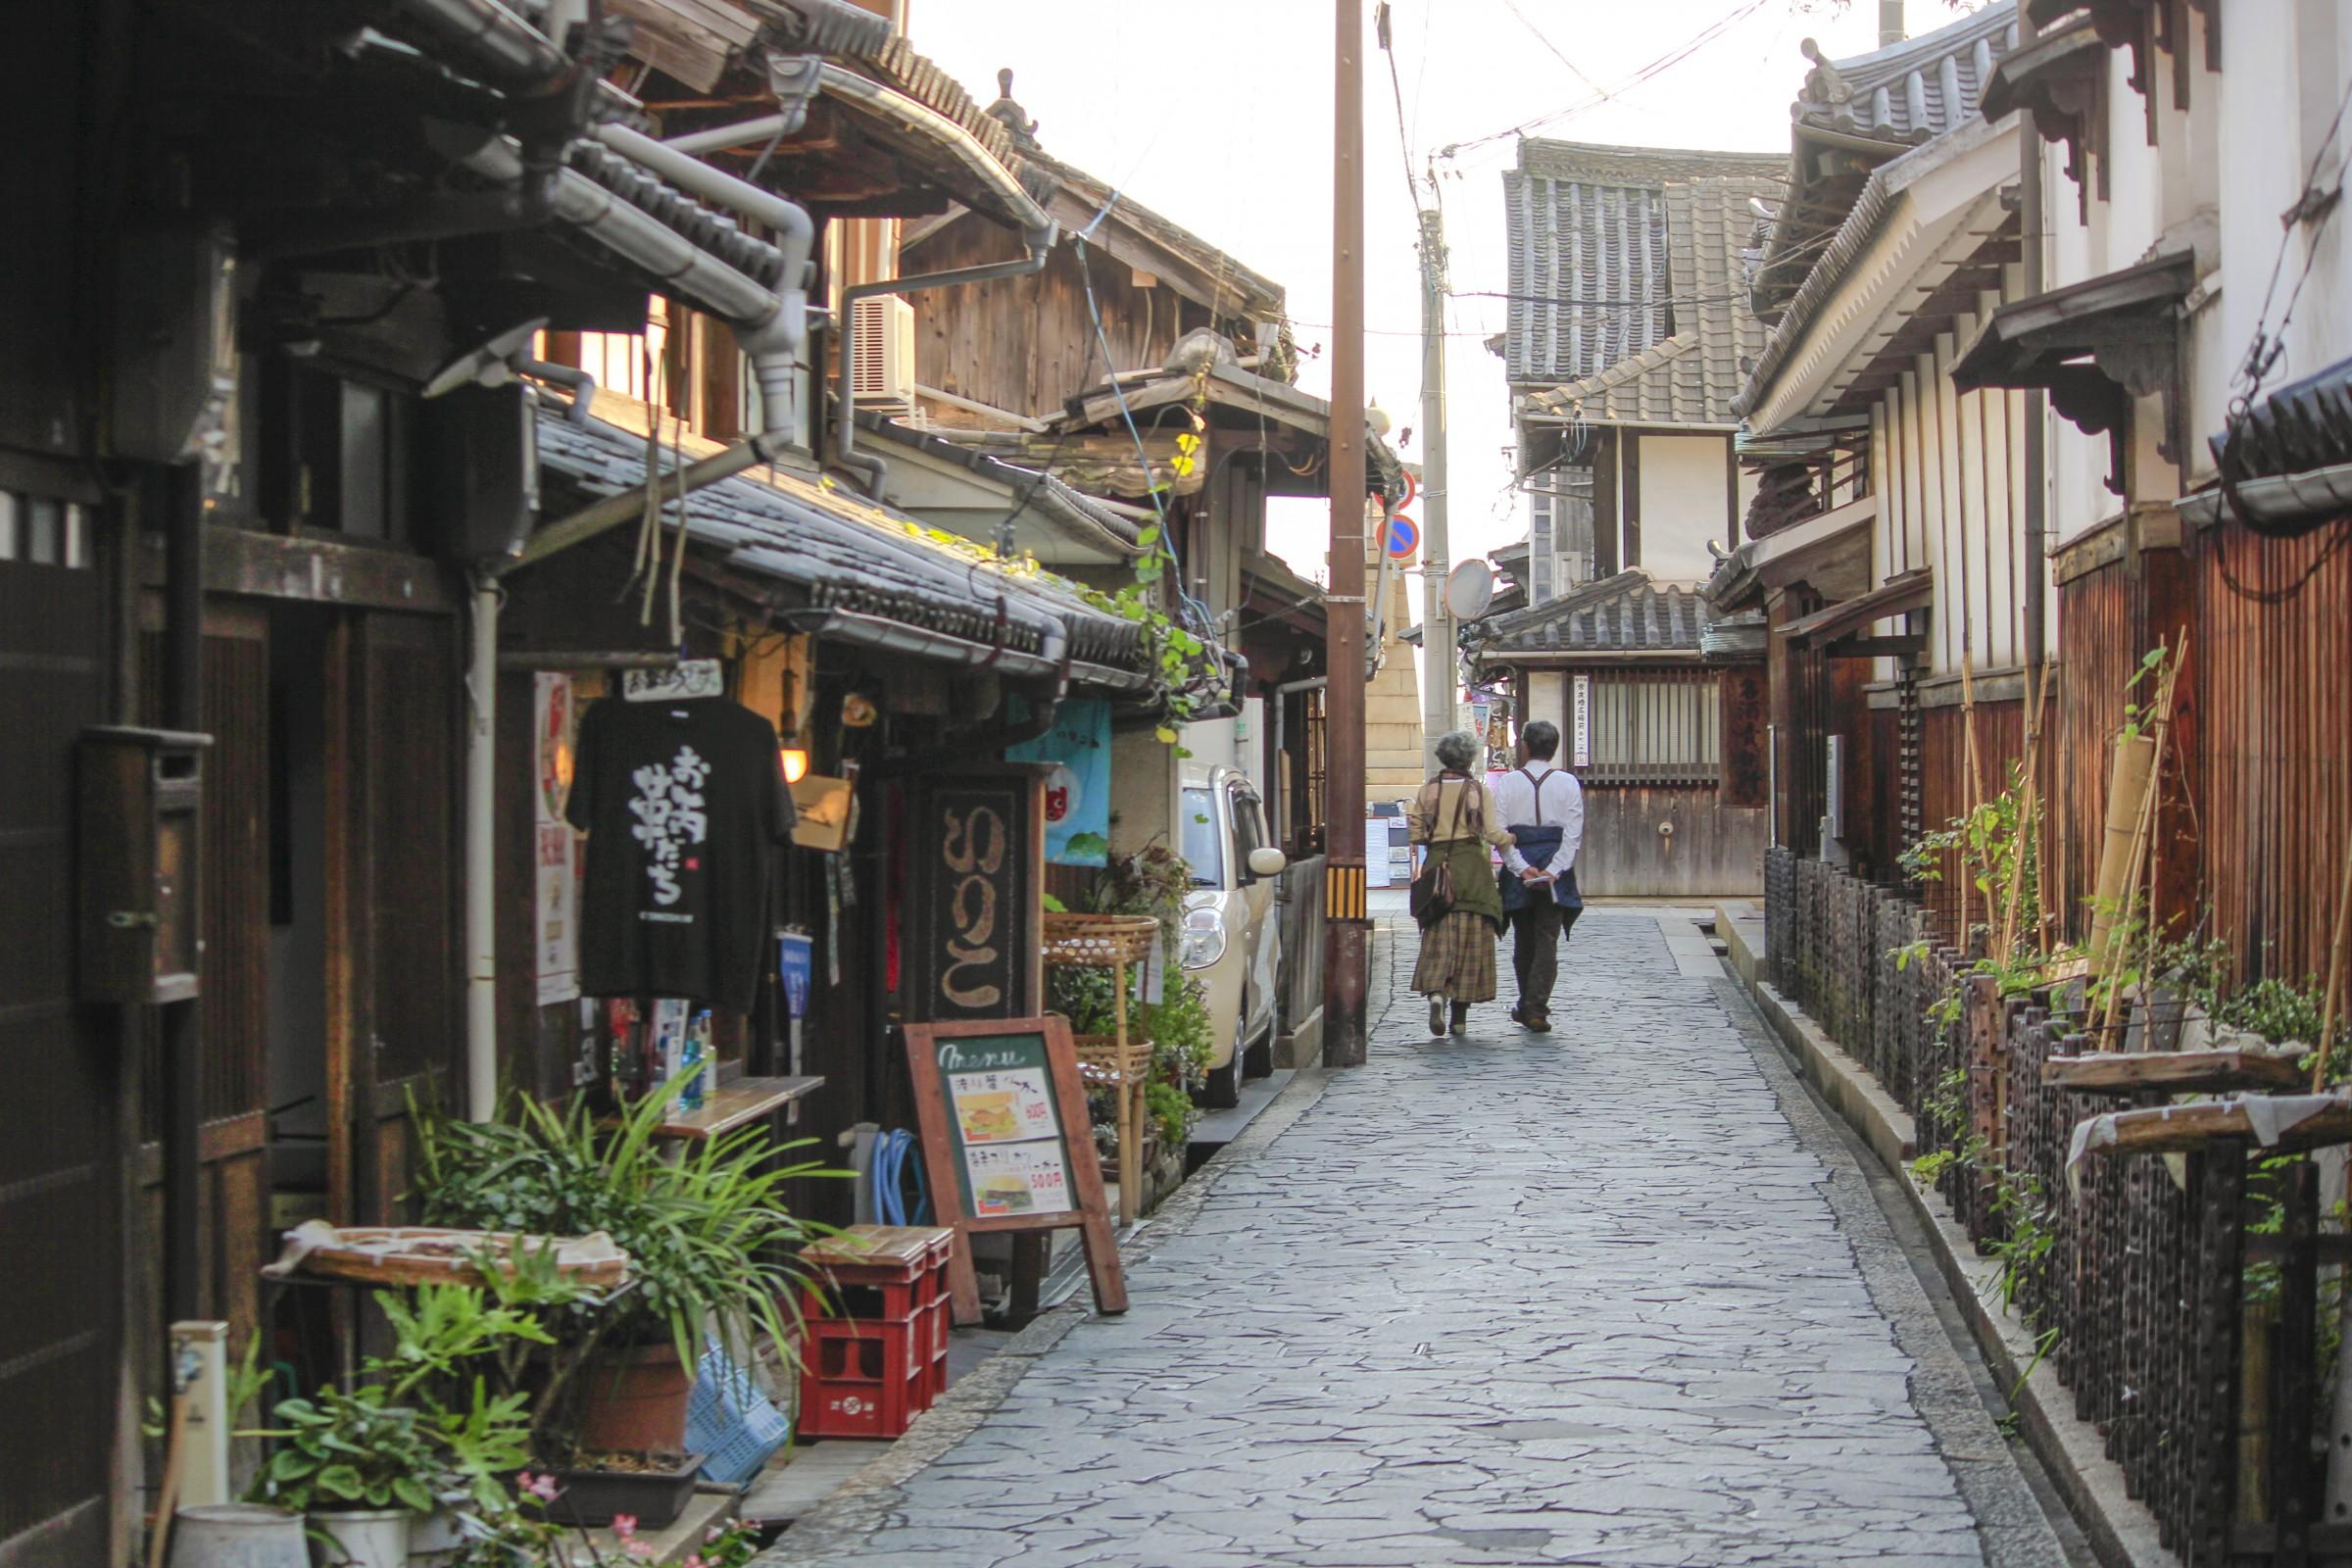 A street in Tomonoura